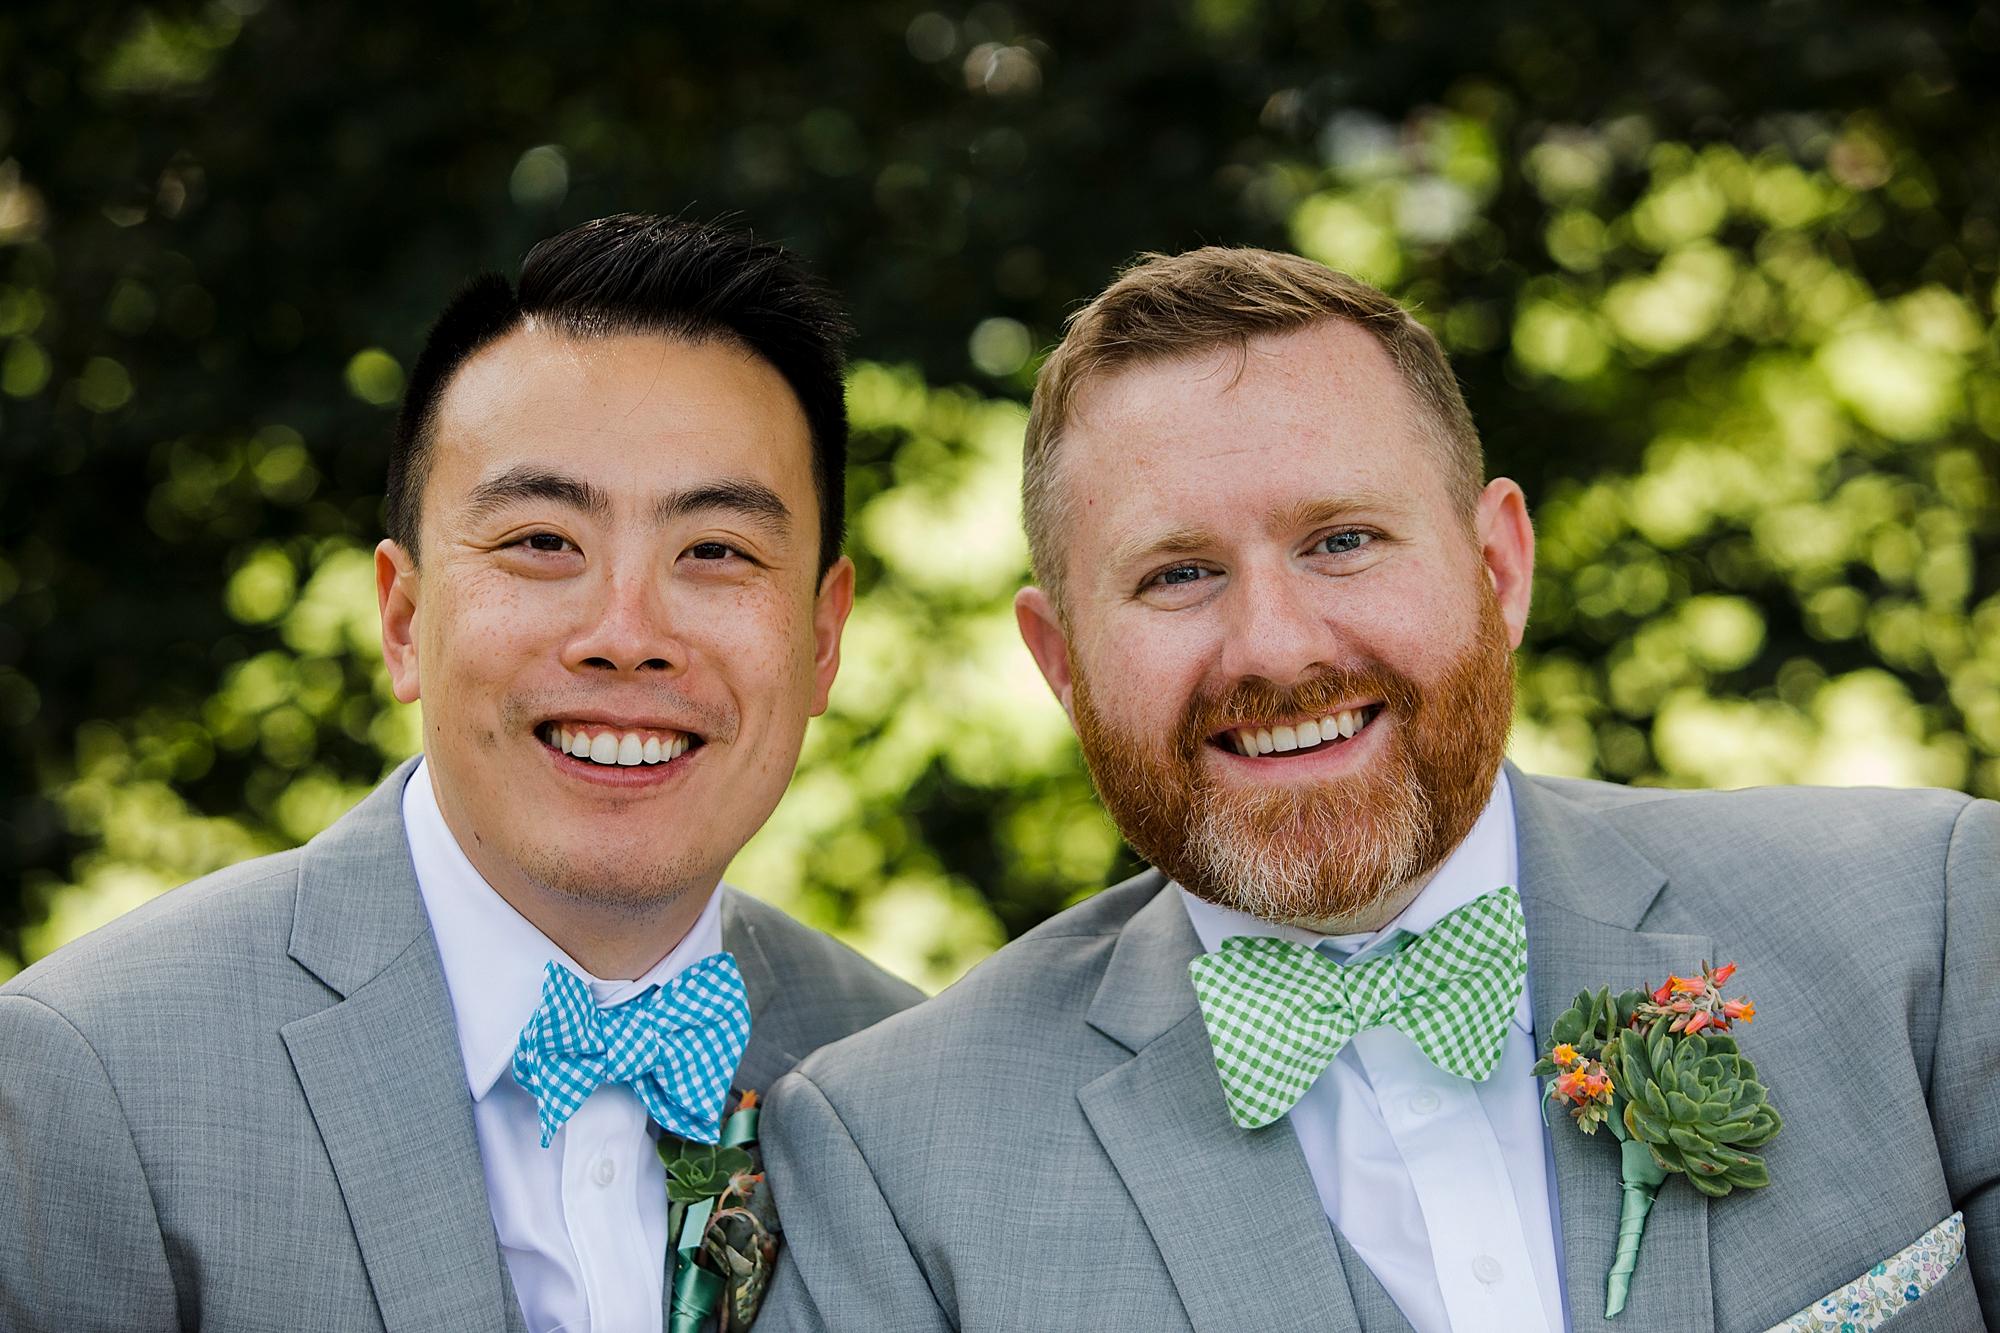 Dan_and_Byron_Love_by_Joe_Mac_Philadelphia_Wedding_LGBTQ_Photography_Gay_Independence_visitor_Center_46.JPG